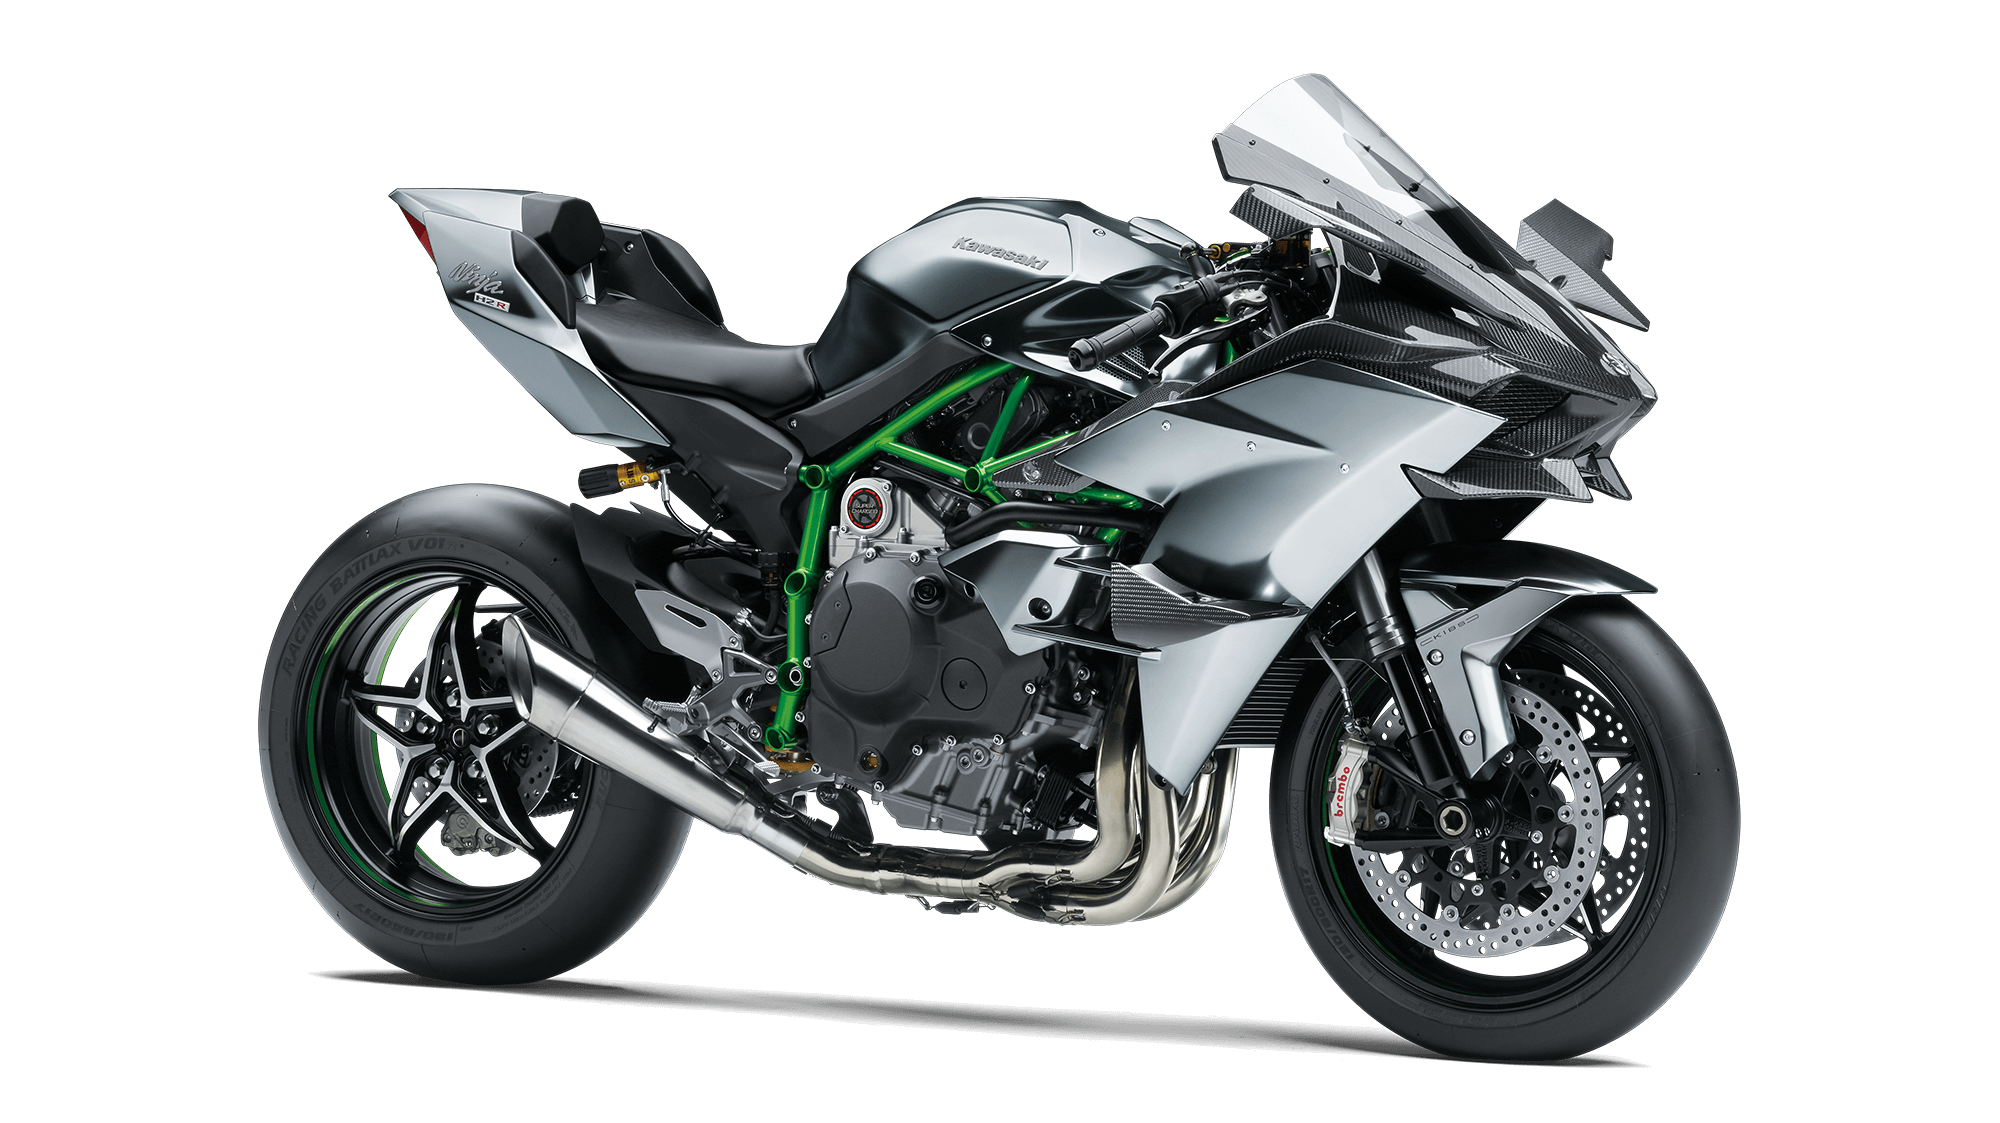 2019 Ninja H2 R Ninja Motorcycle By Kawasaki Kawasaki Ninja